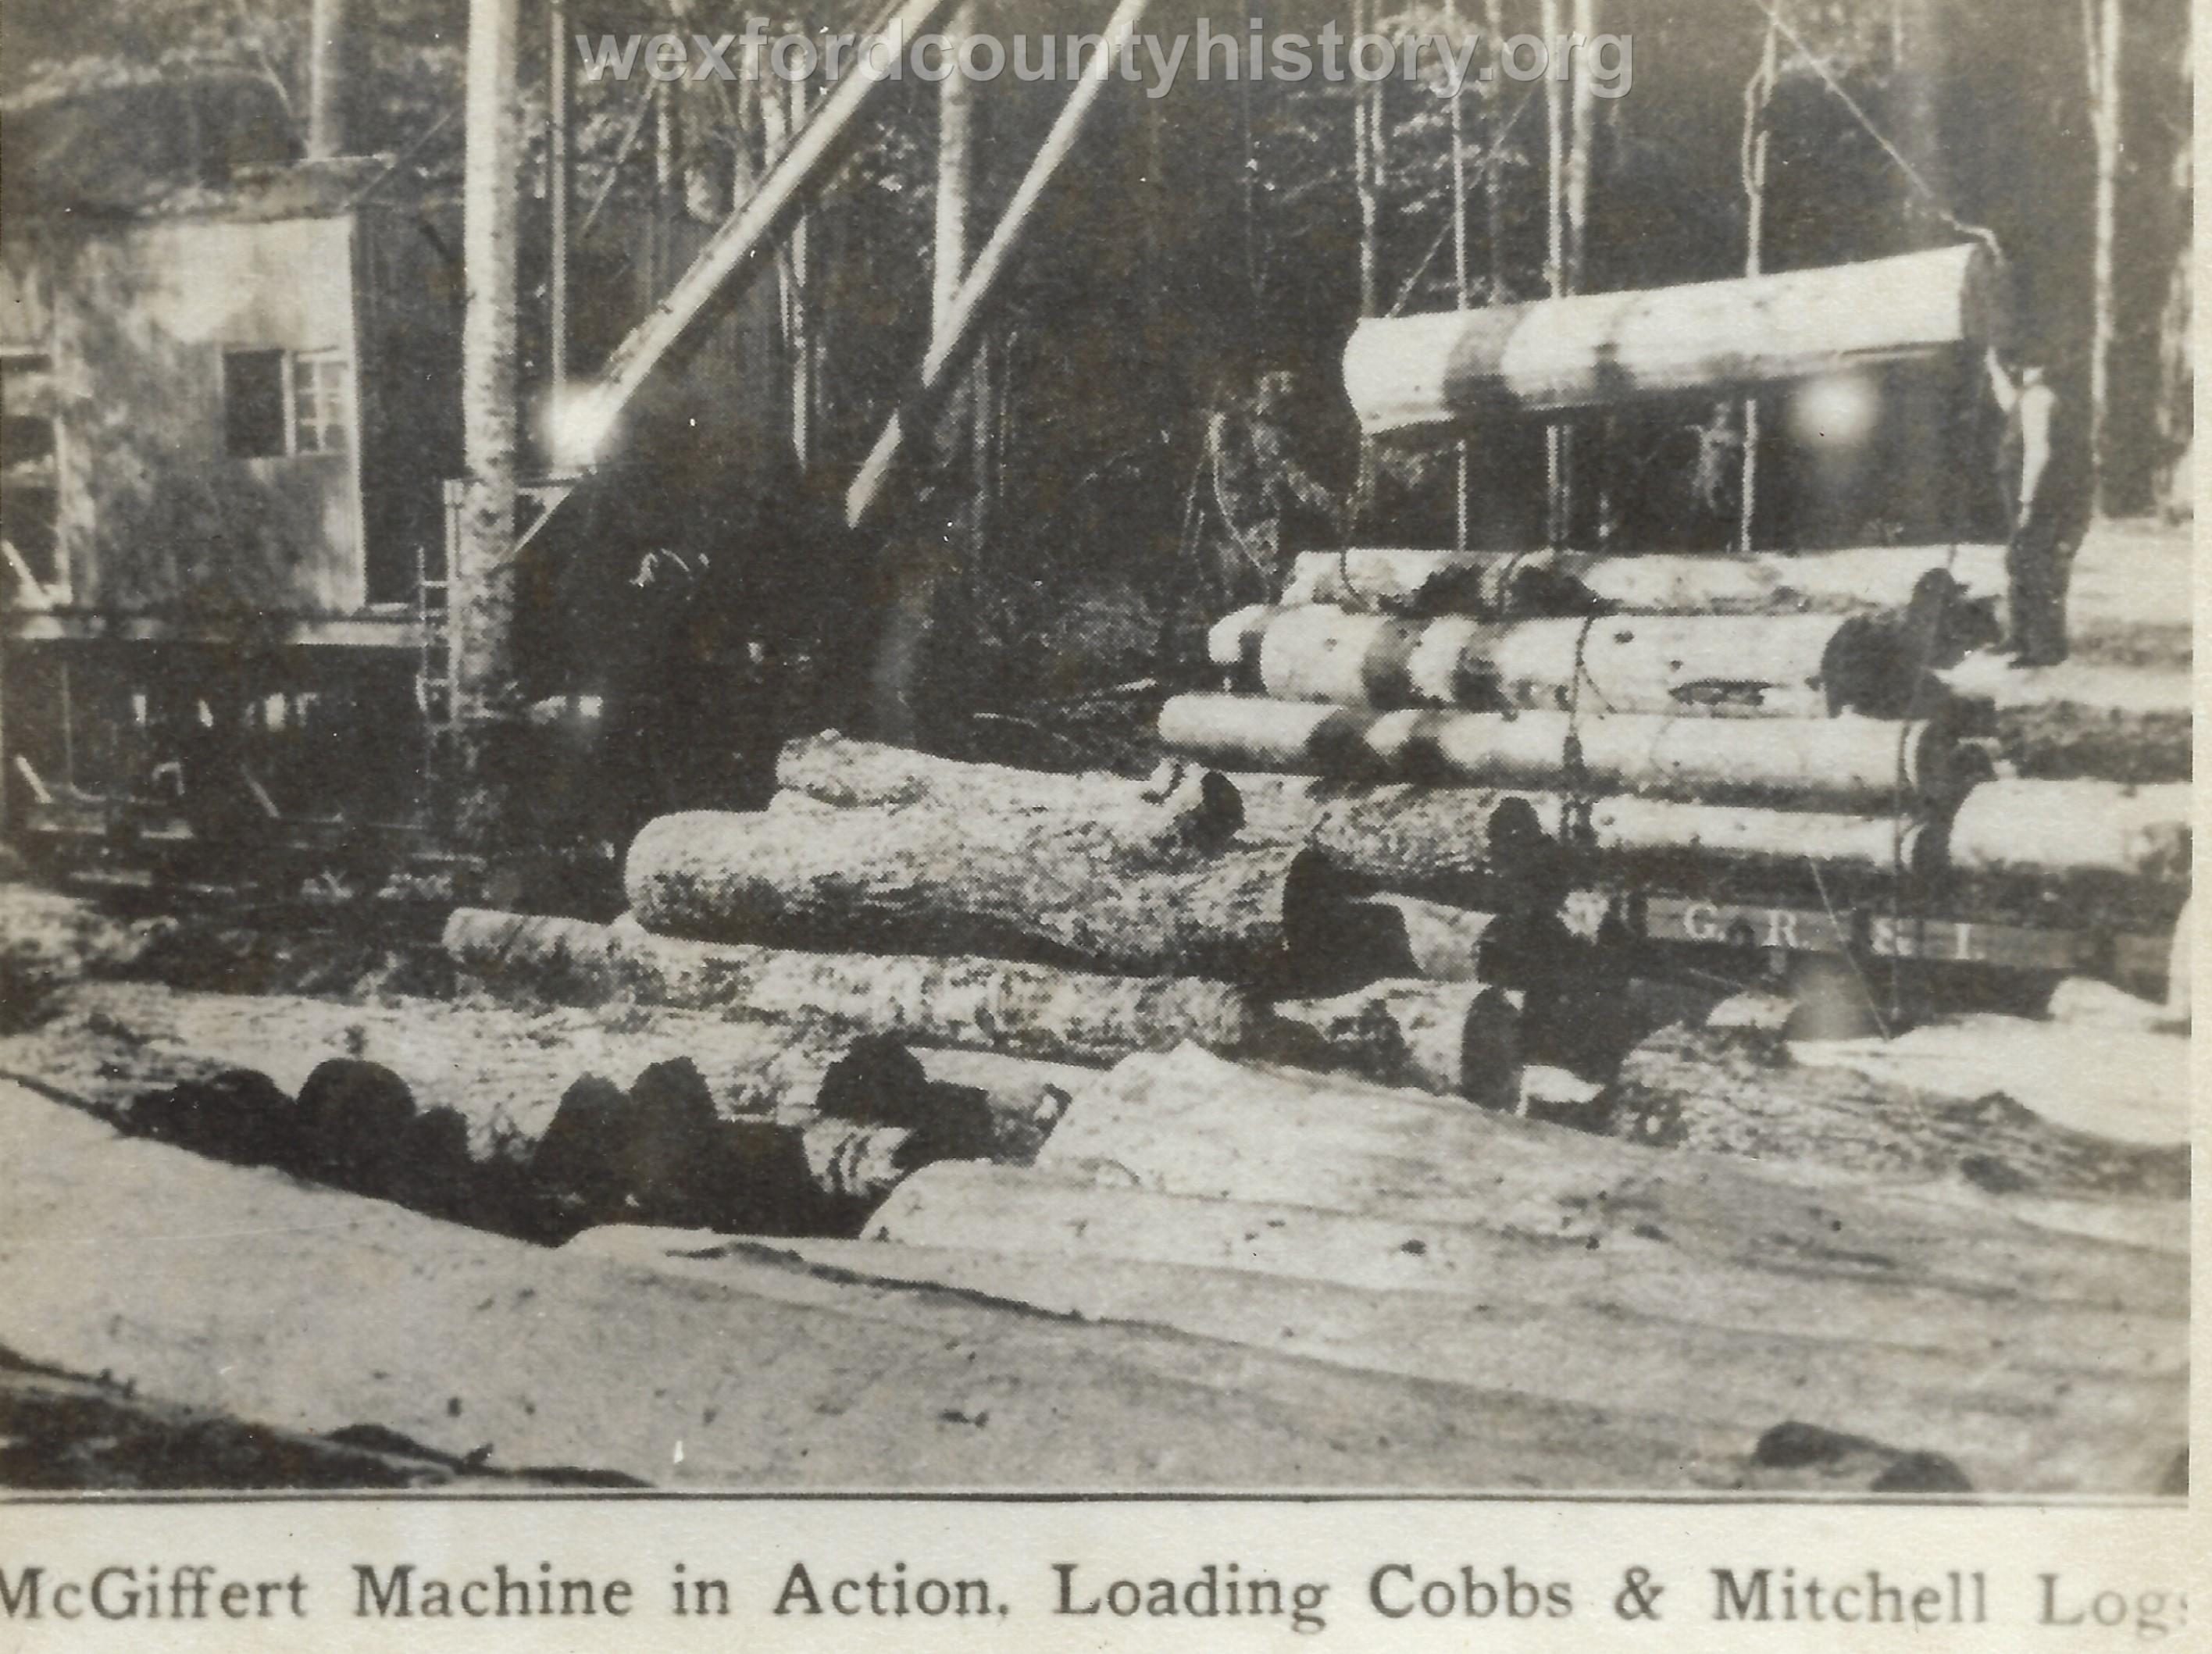 Cadillac-Lumber-McGiffert-Machine-For-Cobbs-And-Mitchell-Company